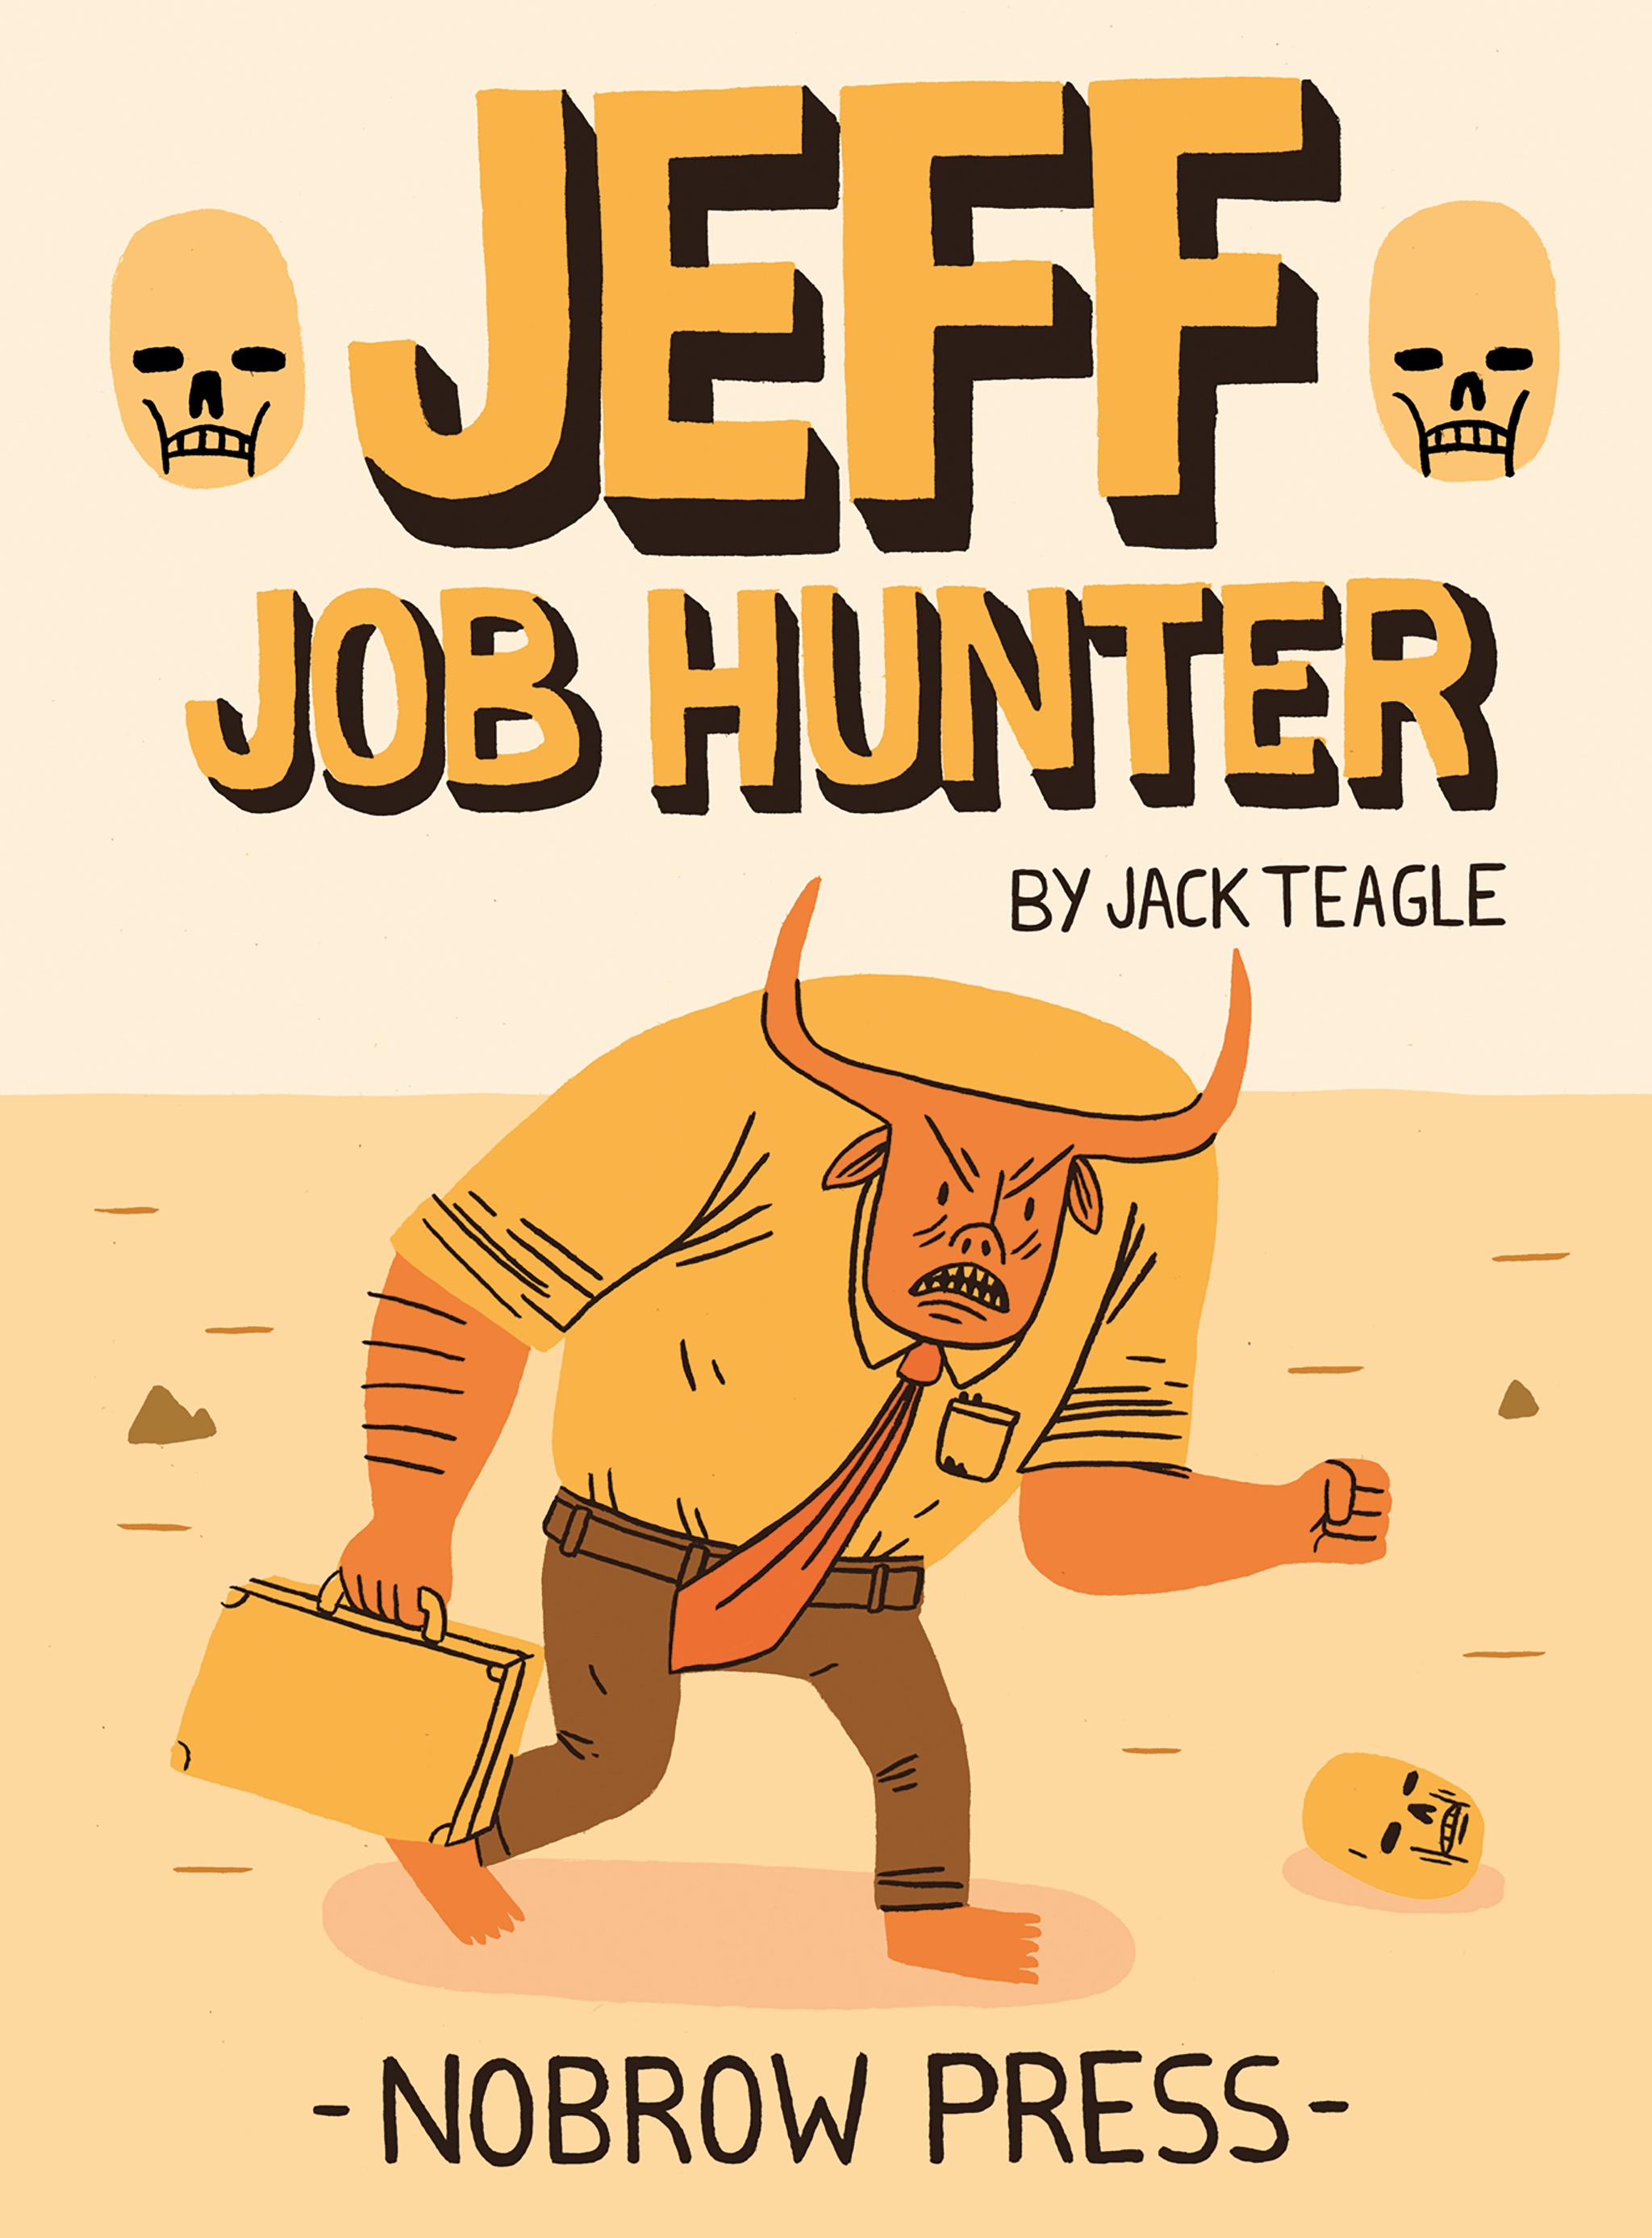 Jeff Job Hunter